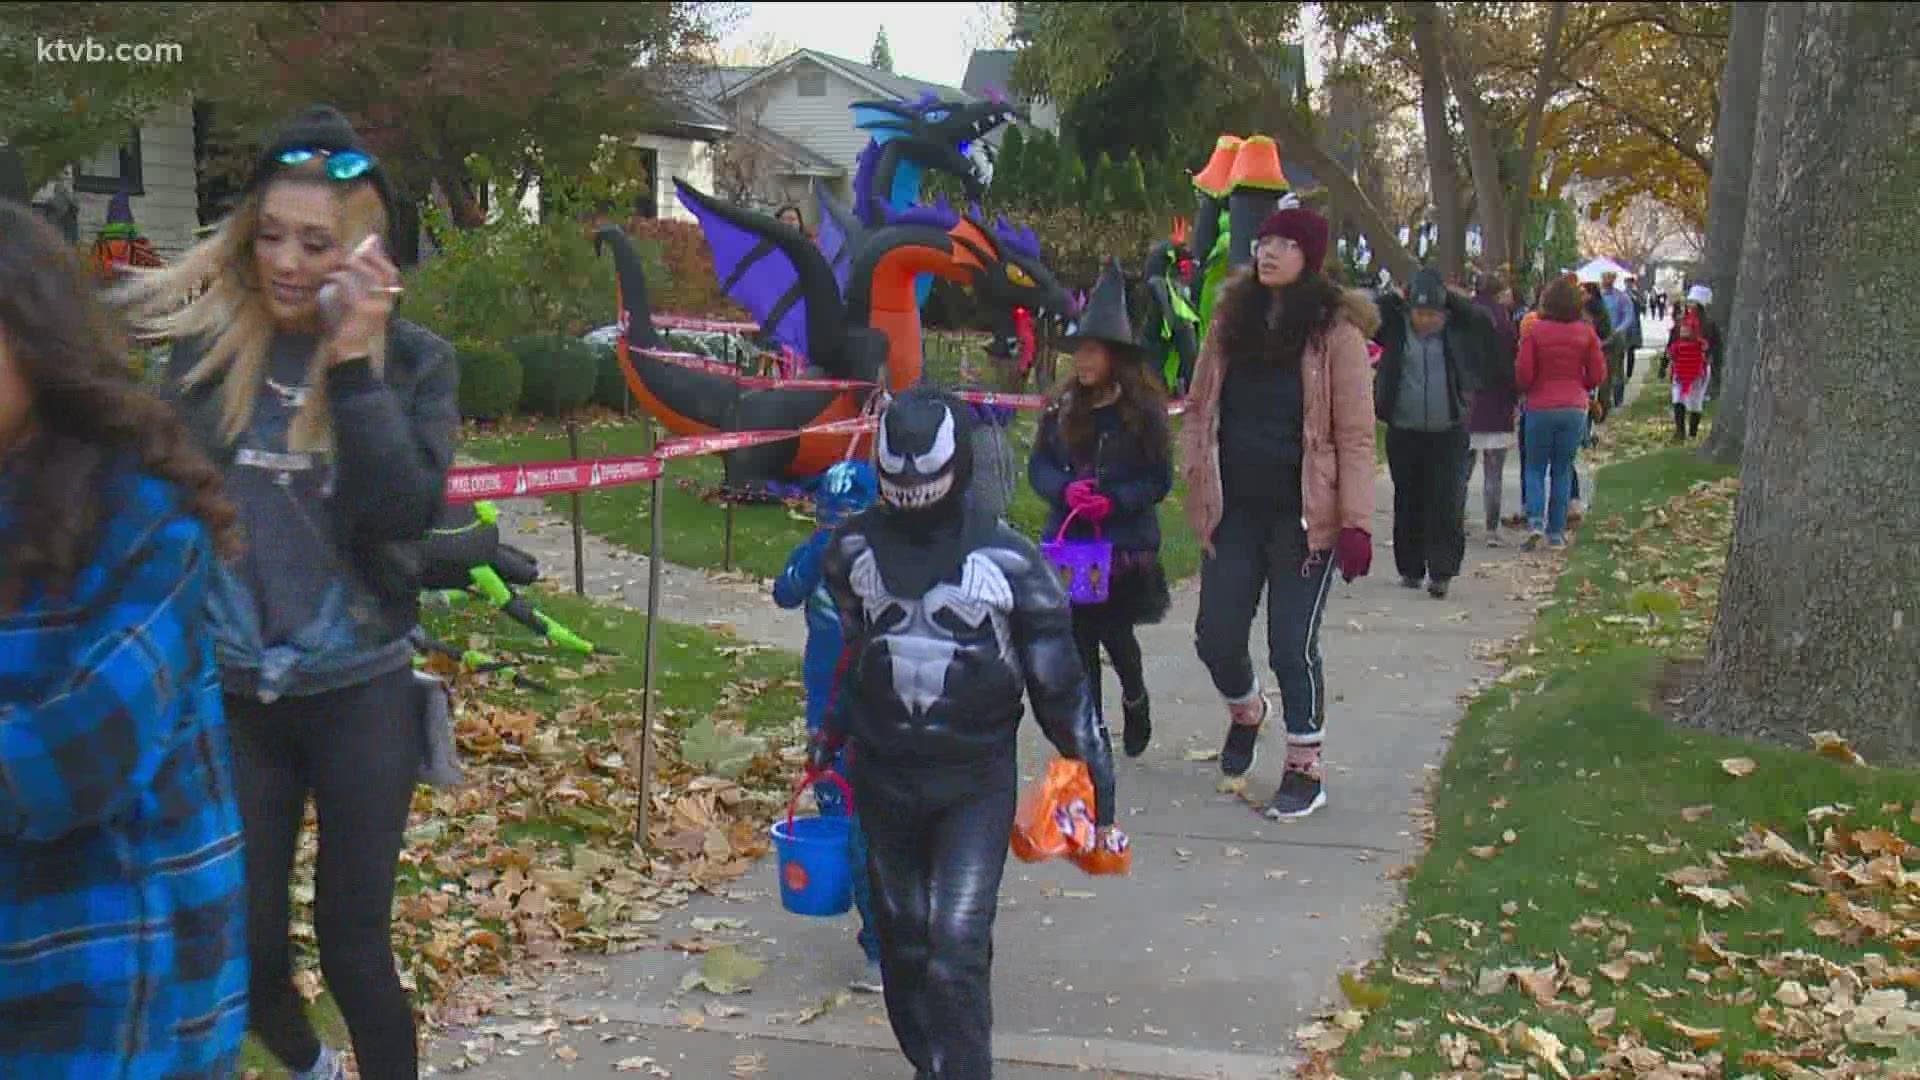 2020 Harrison Blvd Halloween Boise Idaho Neighbors on Boise's popular Harrison Boulevard will not pass out